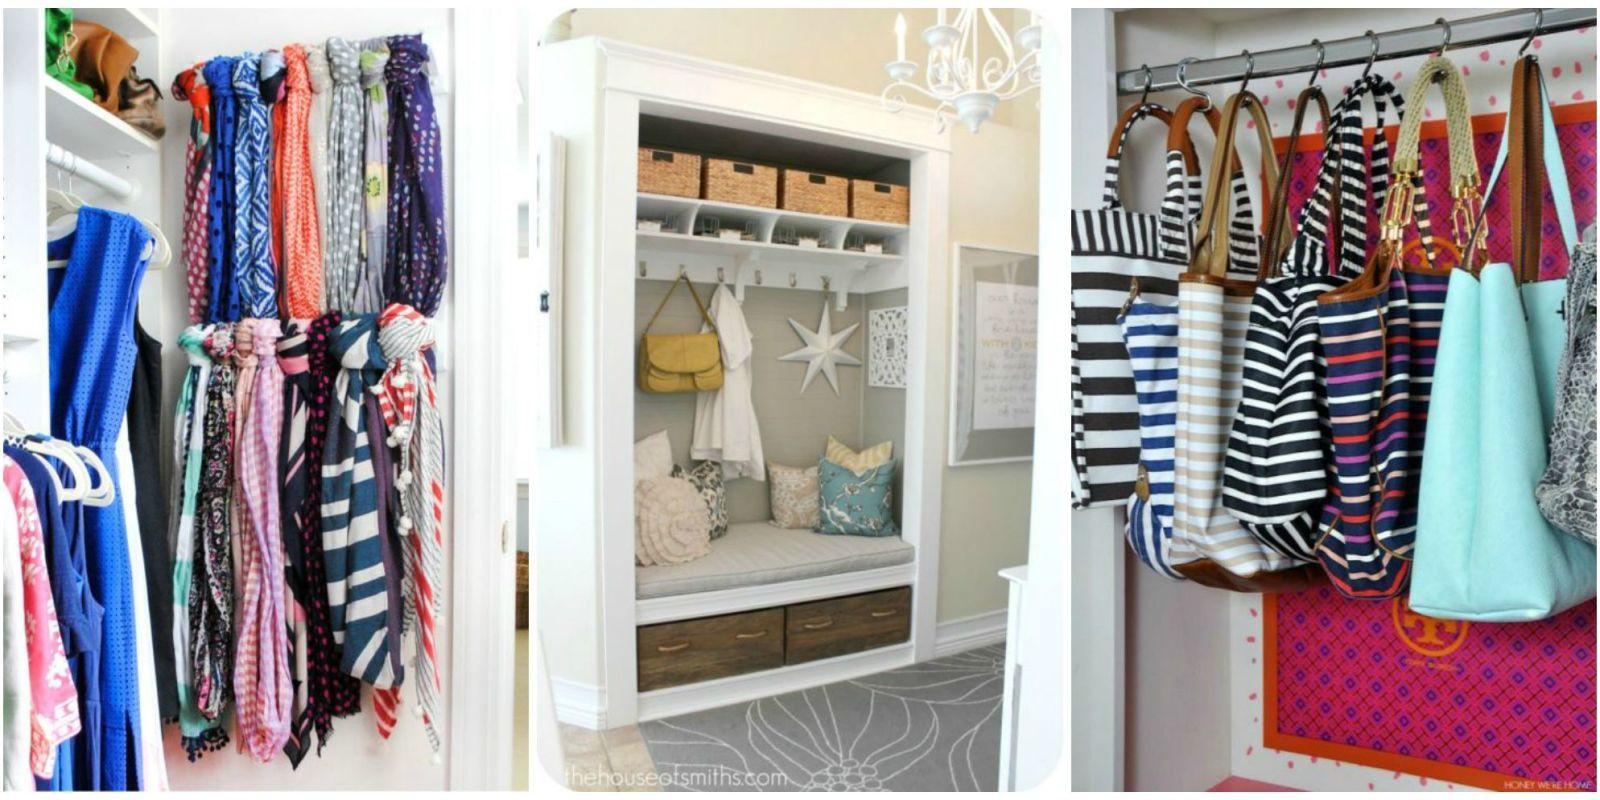 14 Best Closet Organization Ideas How To Organize Your Closet